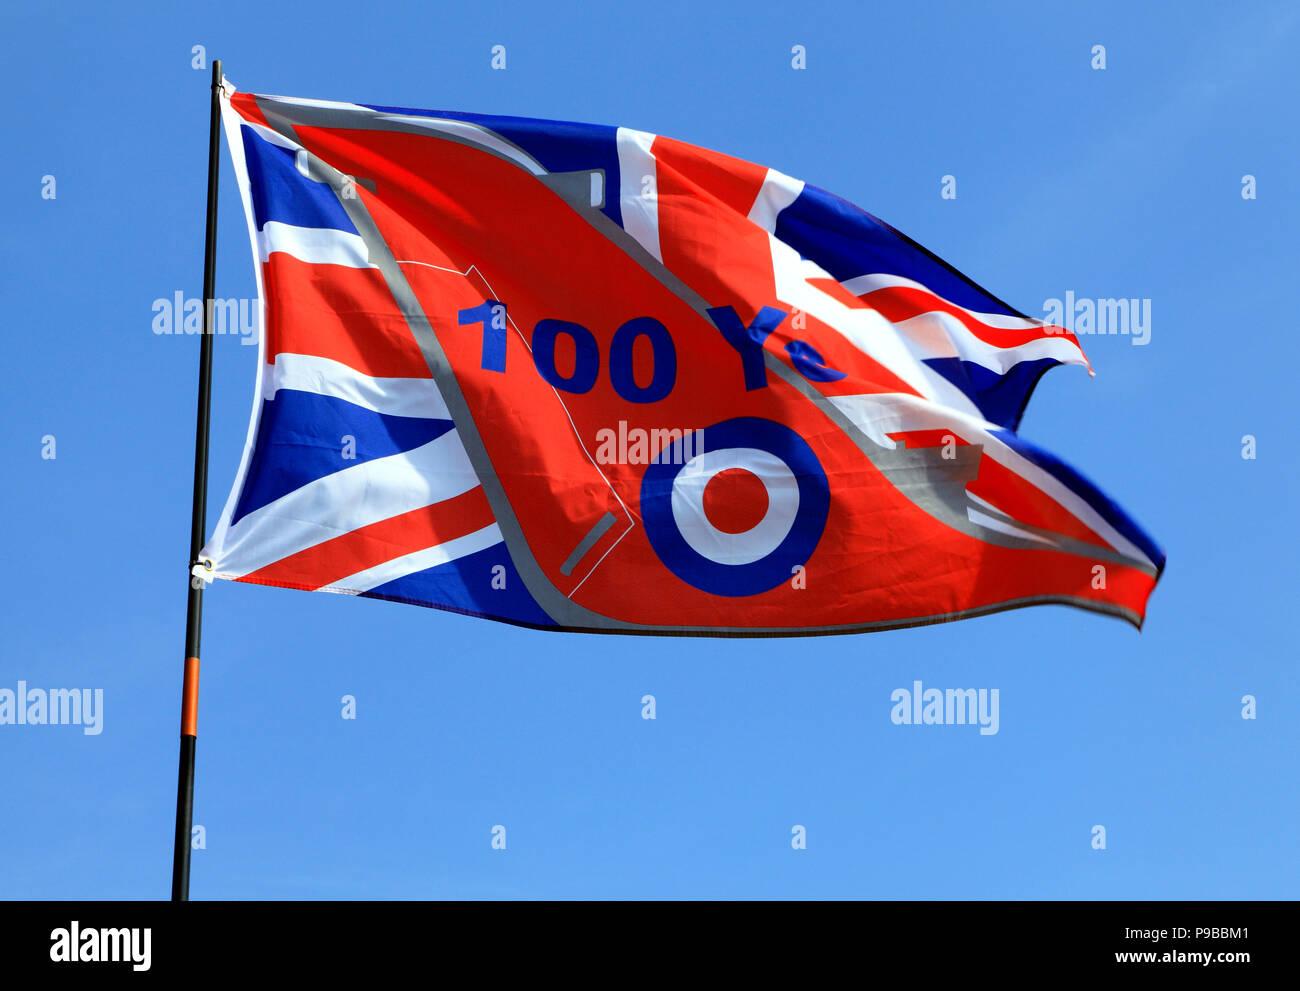 RAF, Royal Air Force, 100 Years, Centenary, commemorative flag, Union Jack, RAF logo - Stock Image